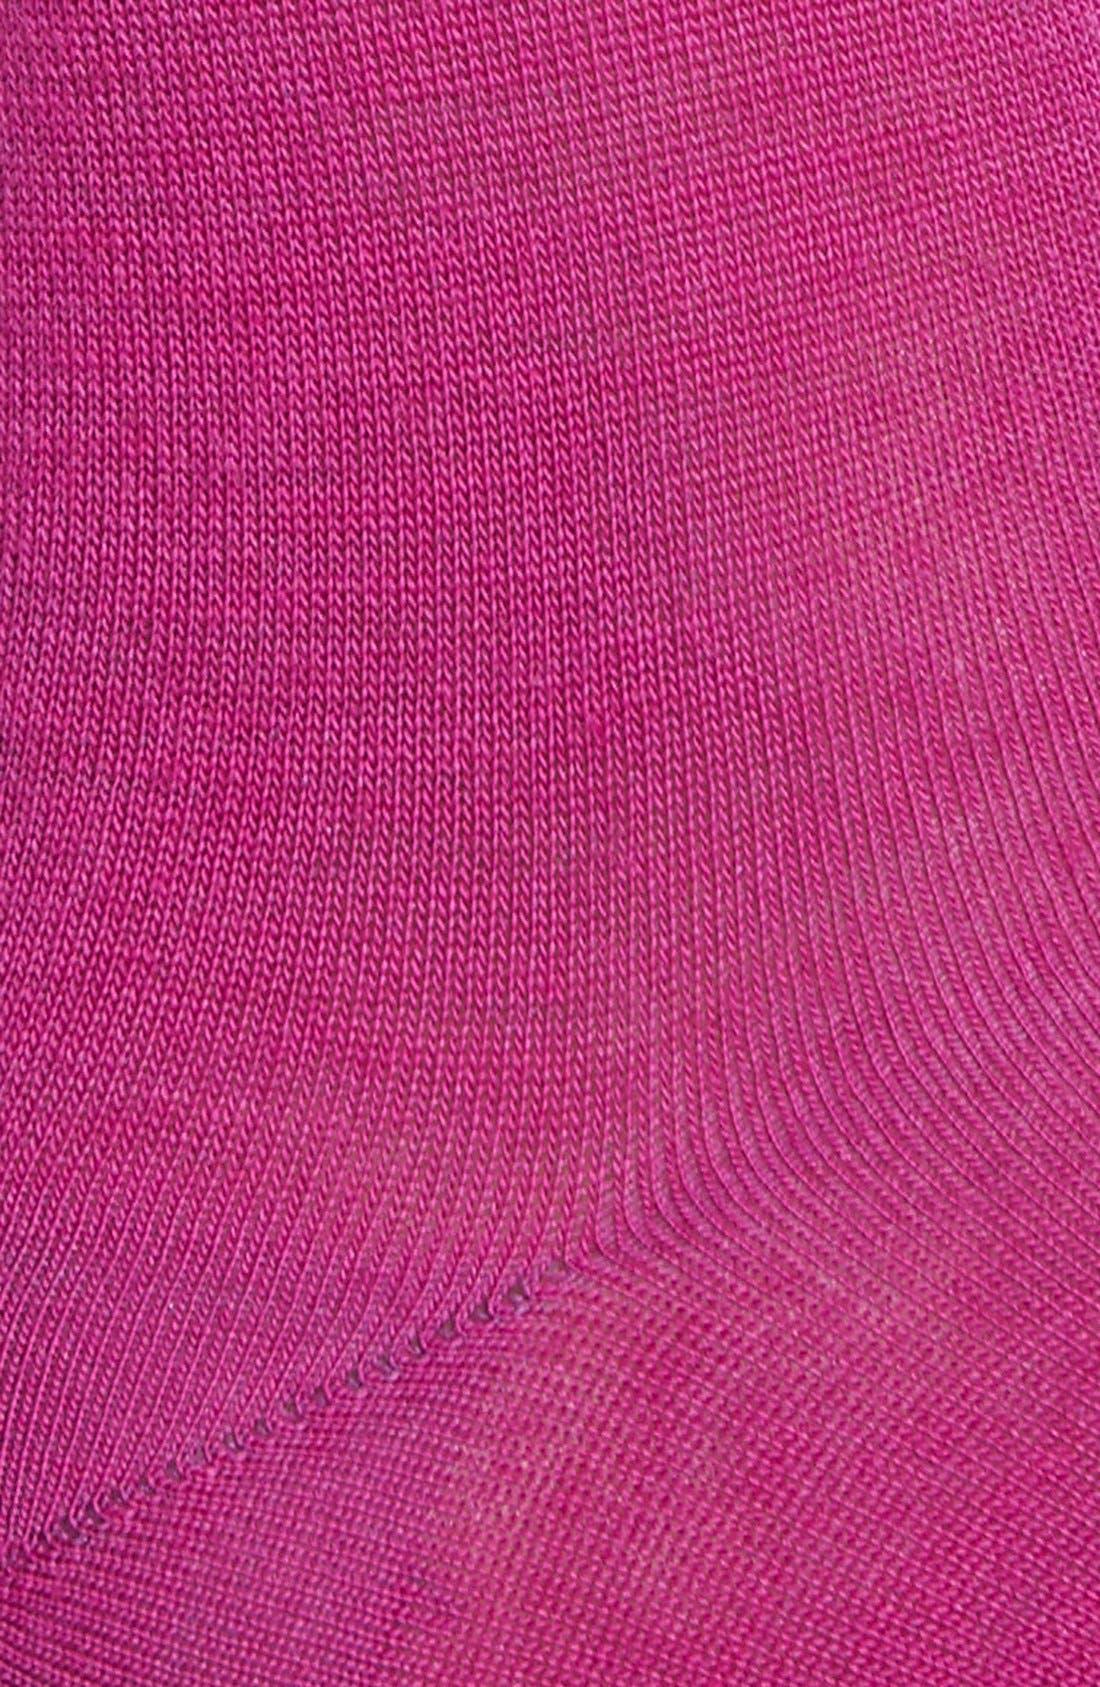 Alternate Image 2  - Nordstrom Flat Knit Merino Wool Crew Socks